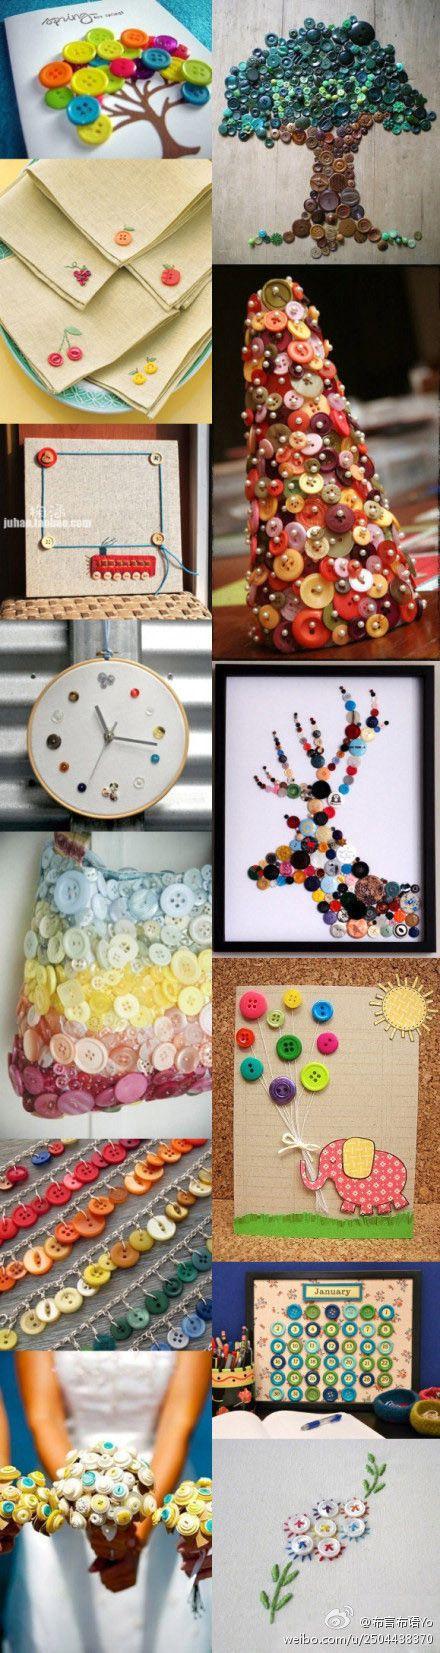 DIY Button Craft Project Ideas  #Japanese Craft